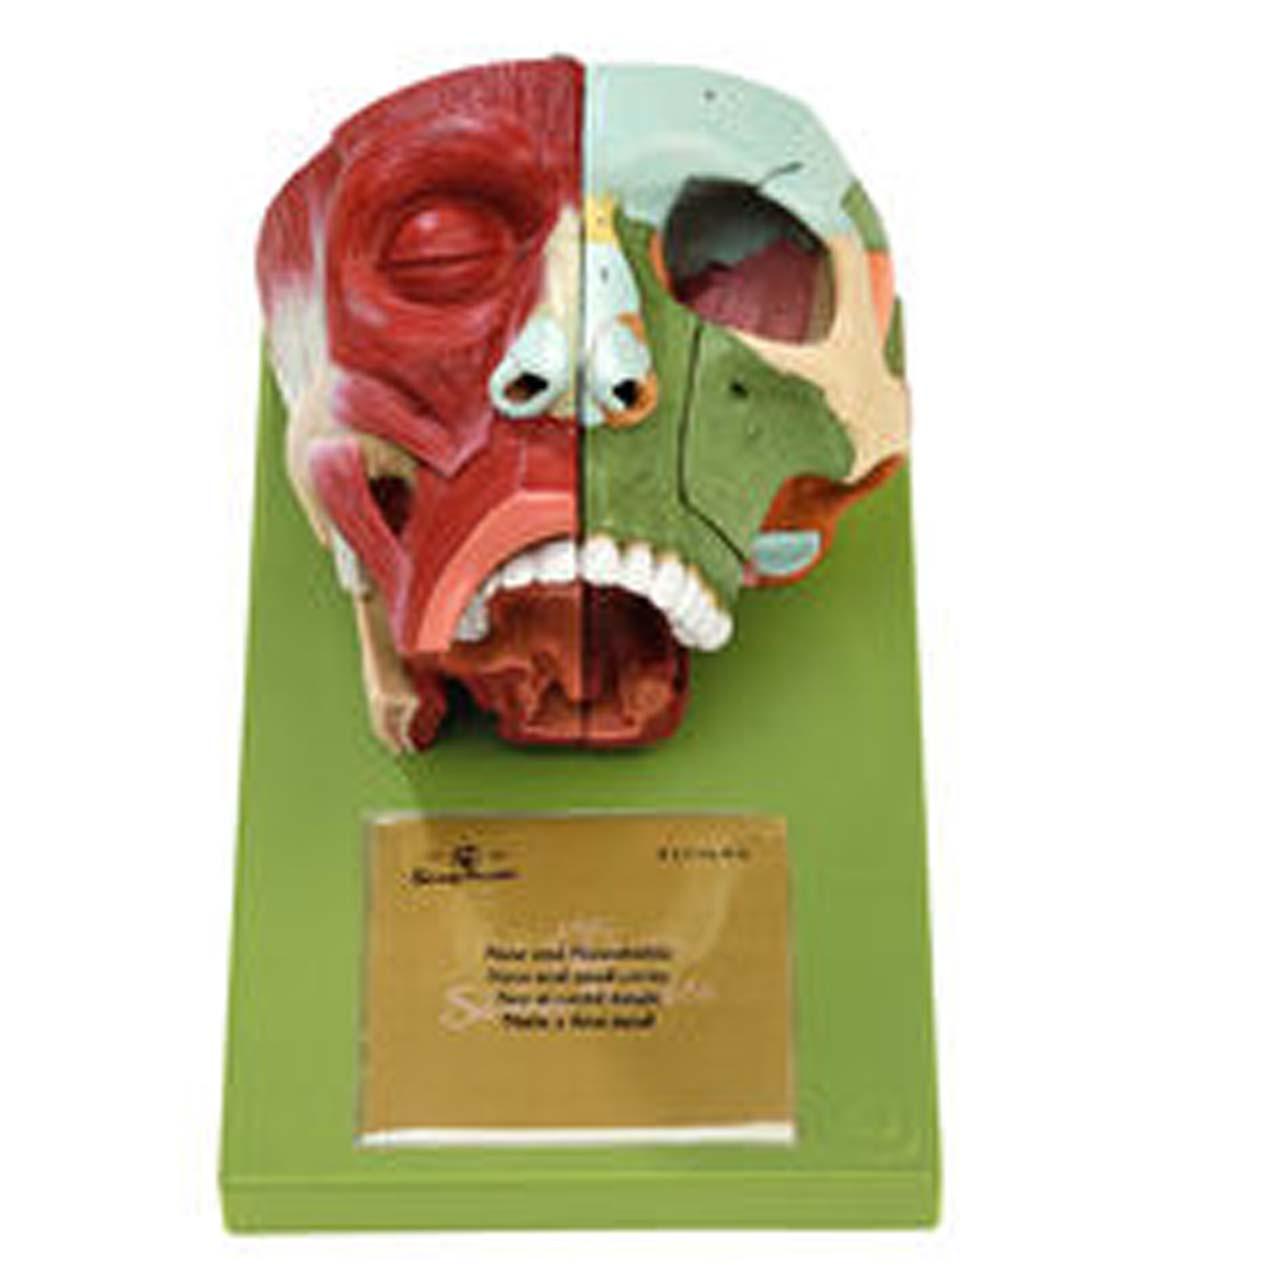 FS3/1 - Nose and Nasal Cavities